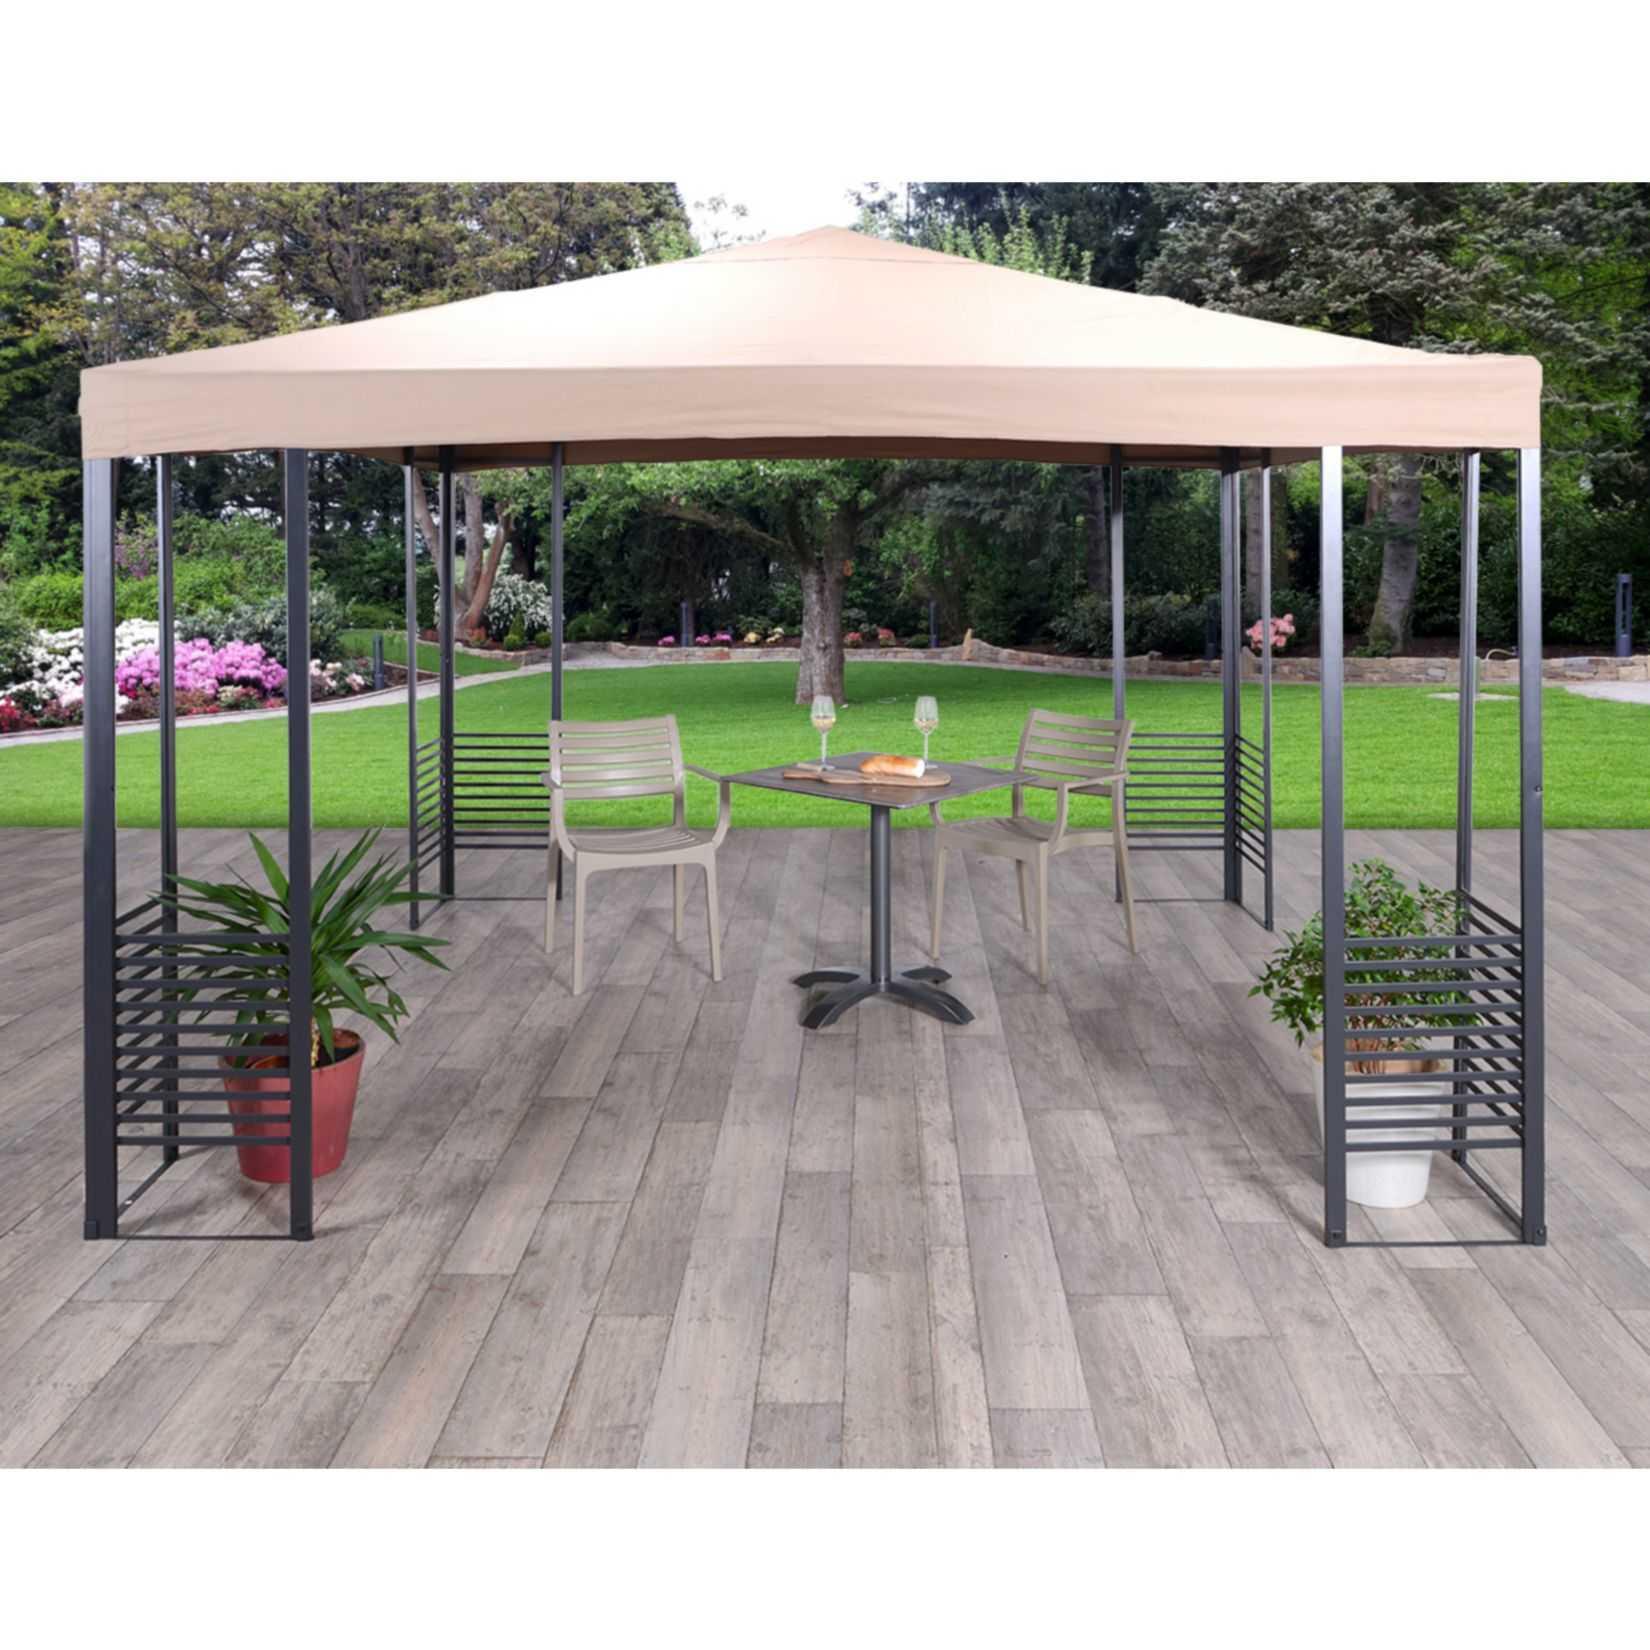 garden impressions alu pavillon 3x3m fuer 13945e inkl versand statt 259e